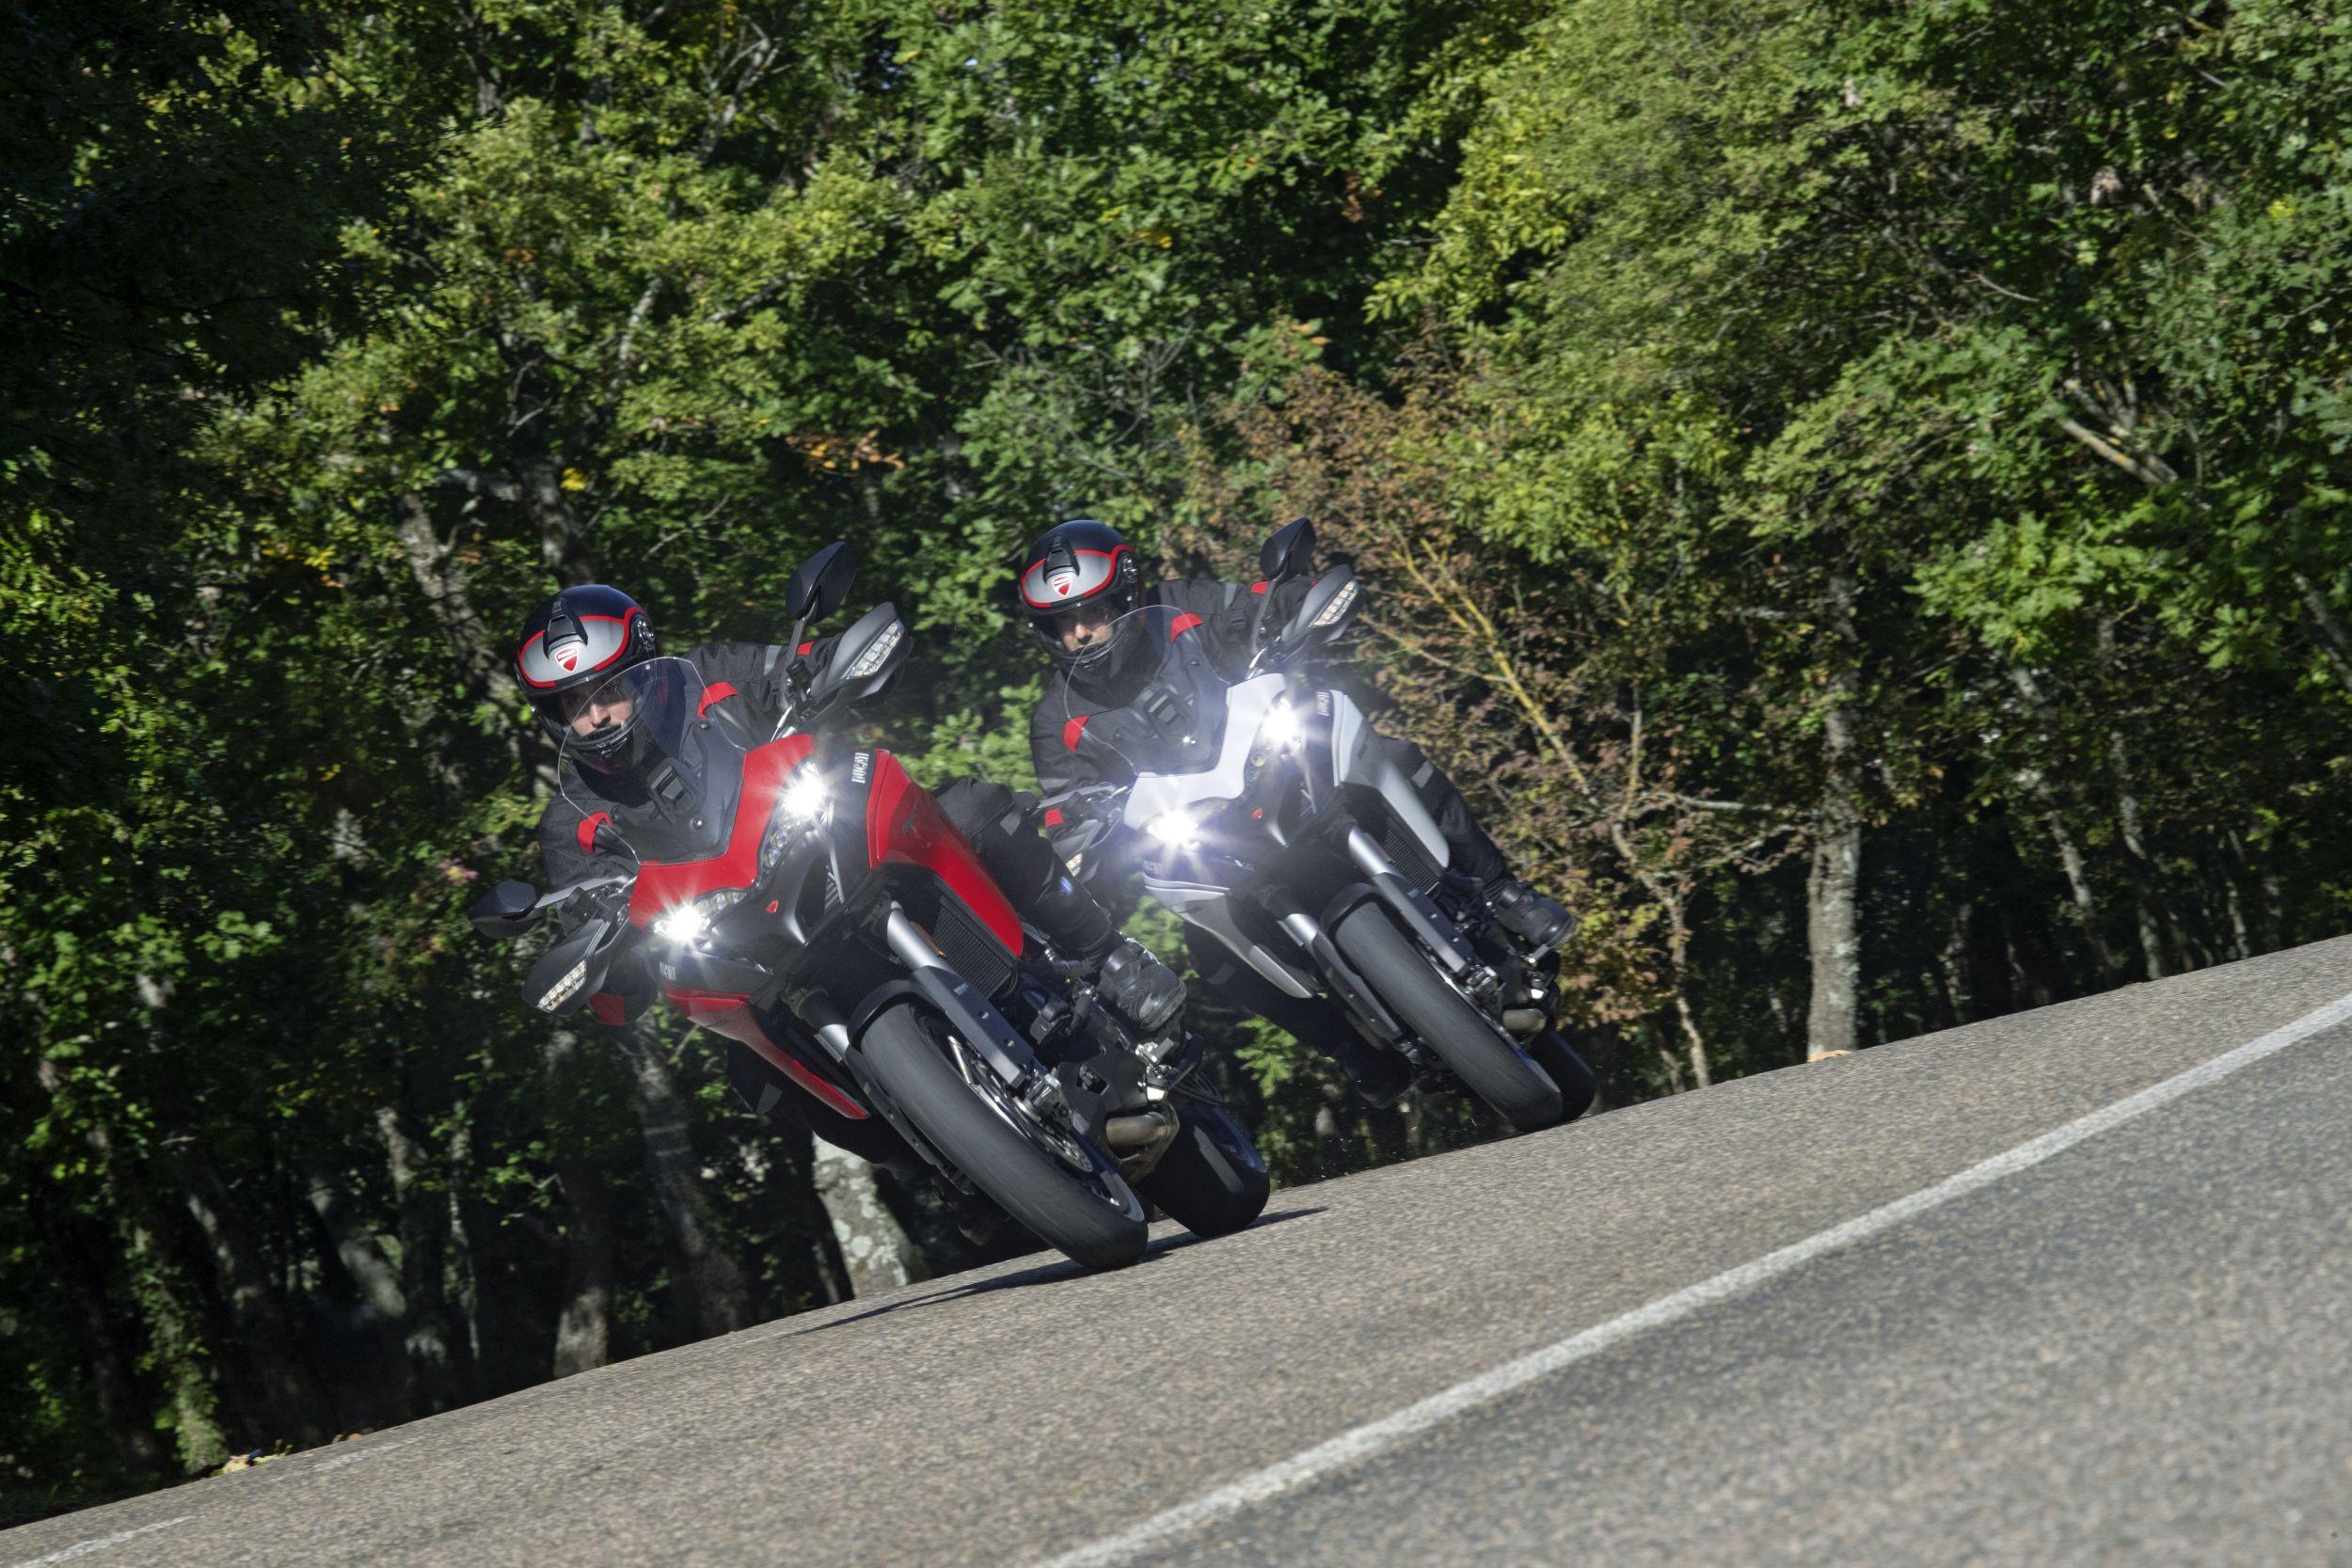 BMW F 900 XR vs. Ducati Multistrada 950 S und Yamaha